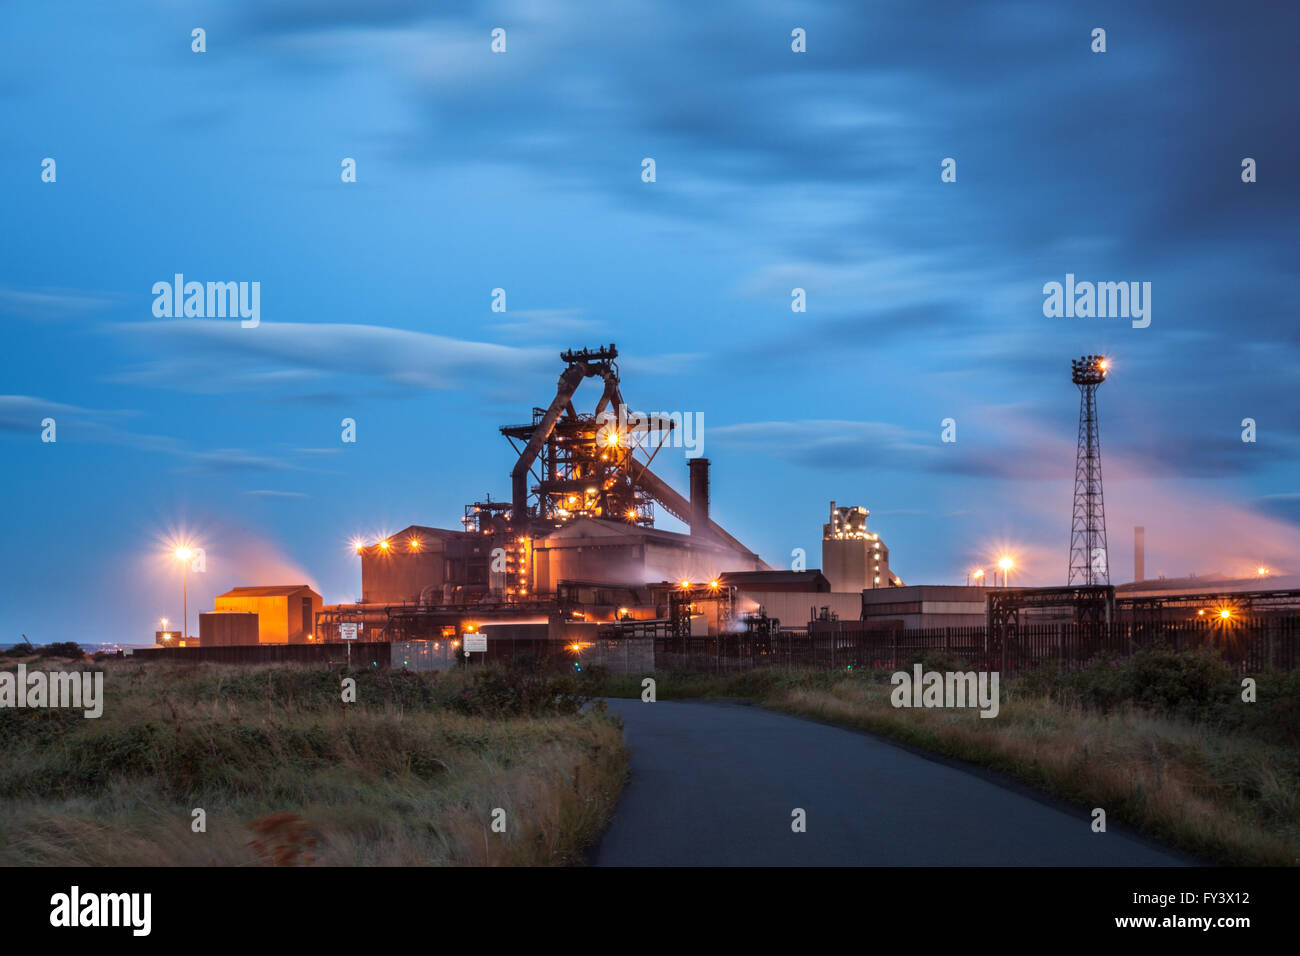 SSI Blast furnace, South Gare, Dusk, Teesside, England - Stock Image